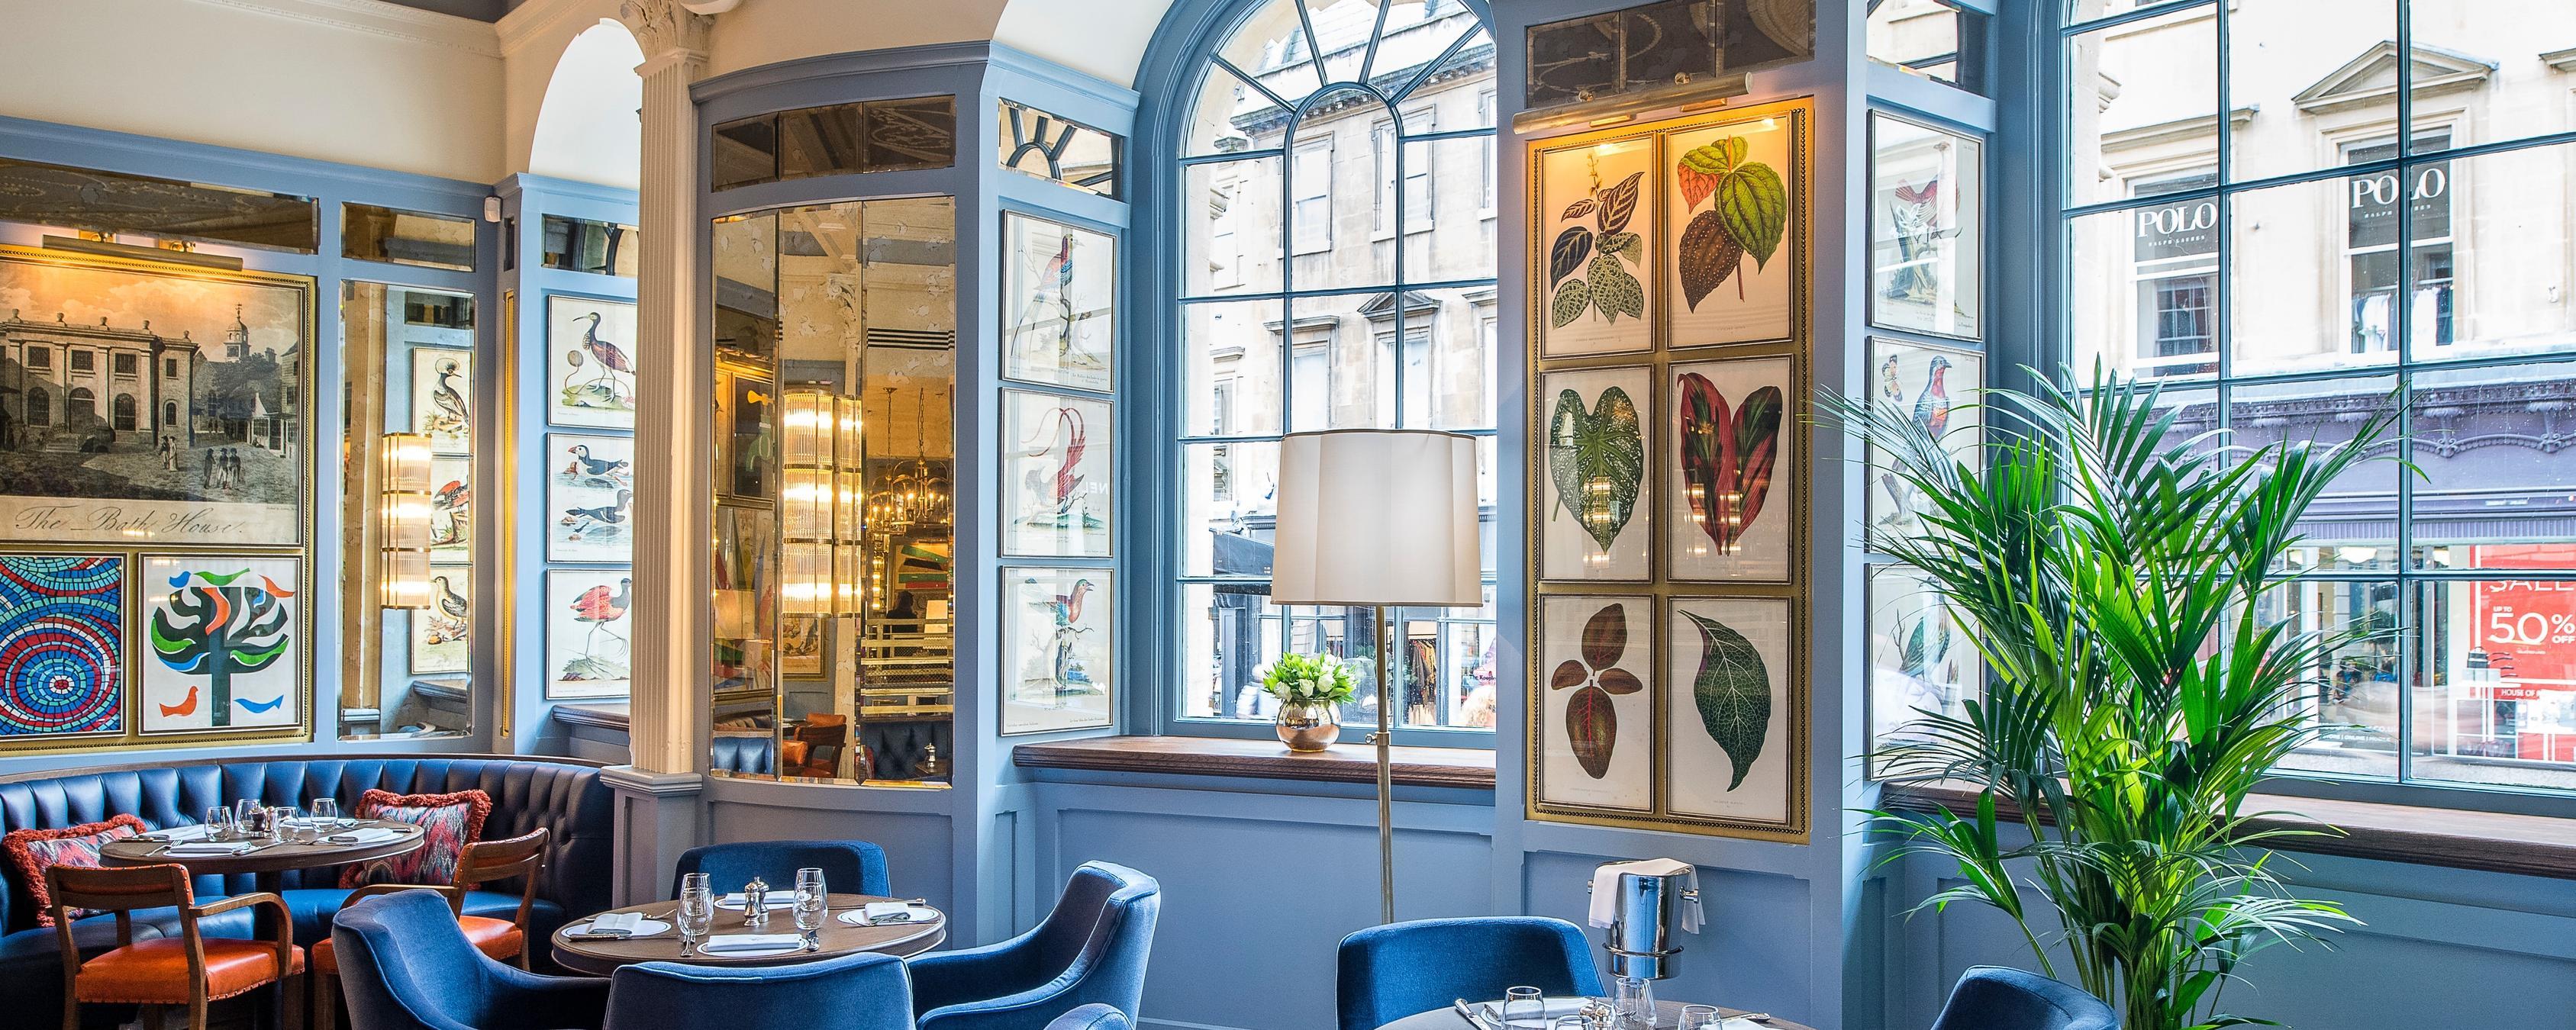 The Ivy Bath Brasserie Brand Cover